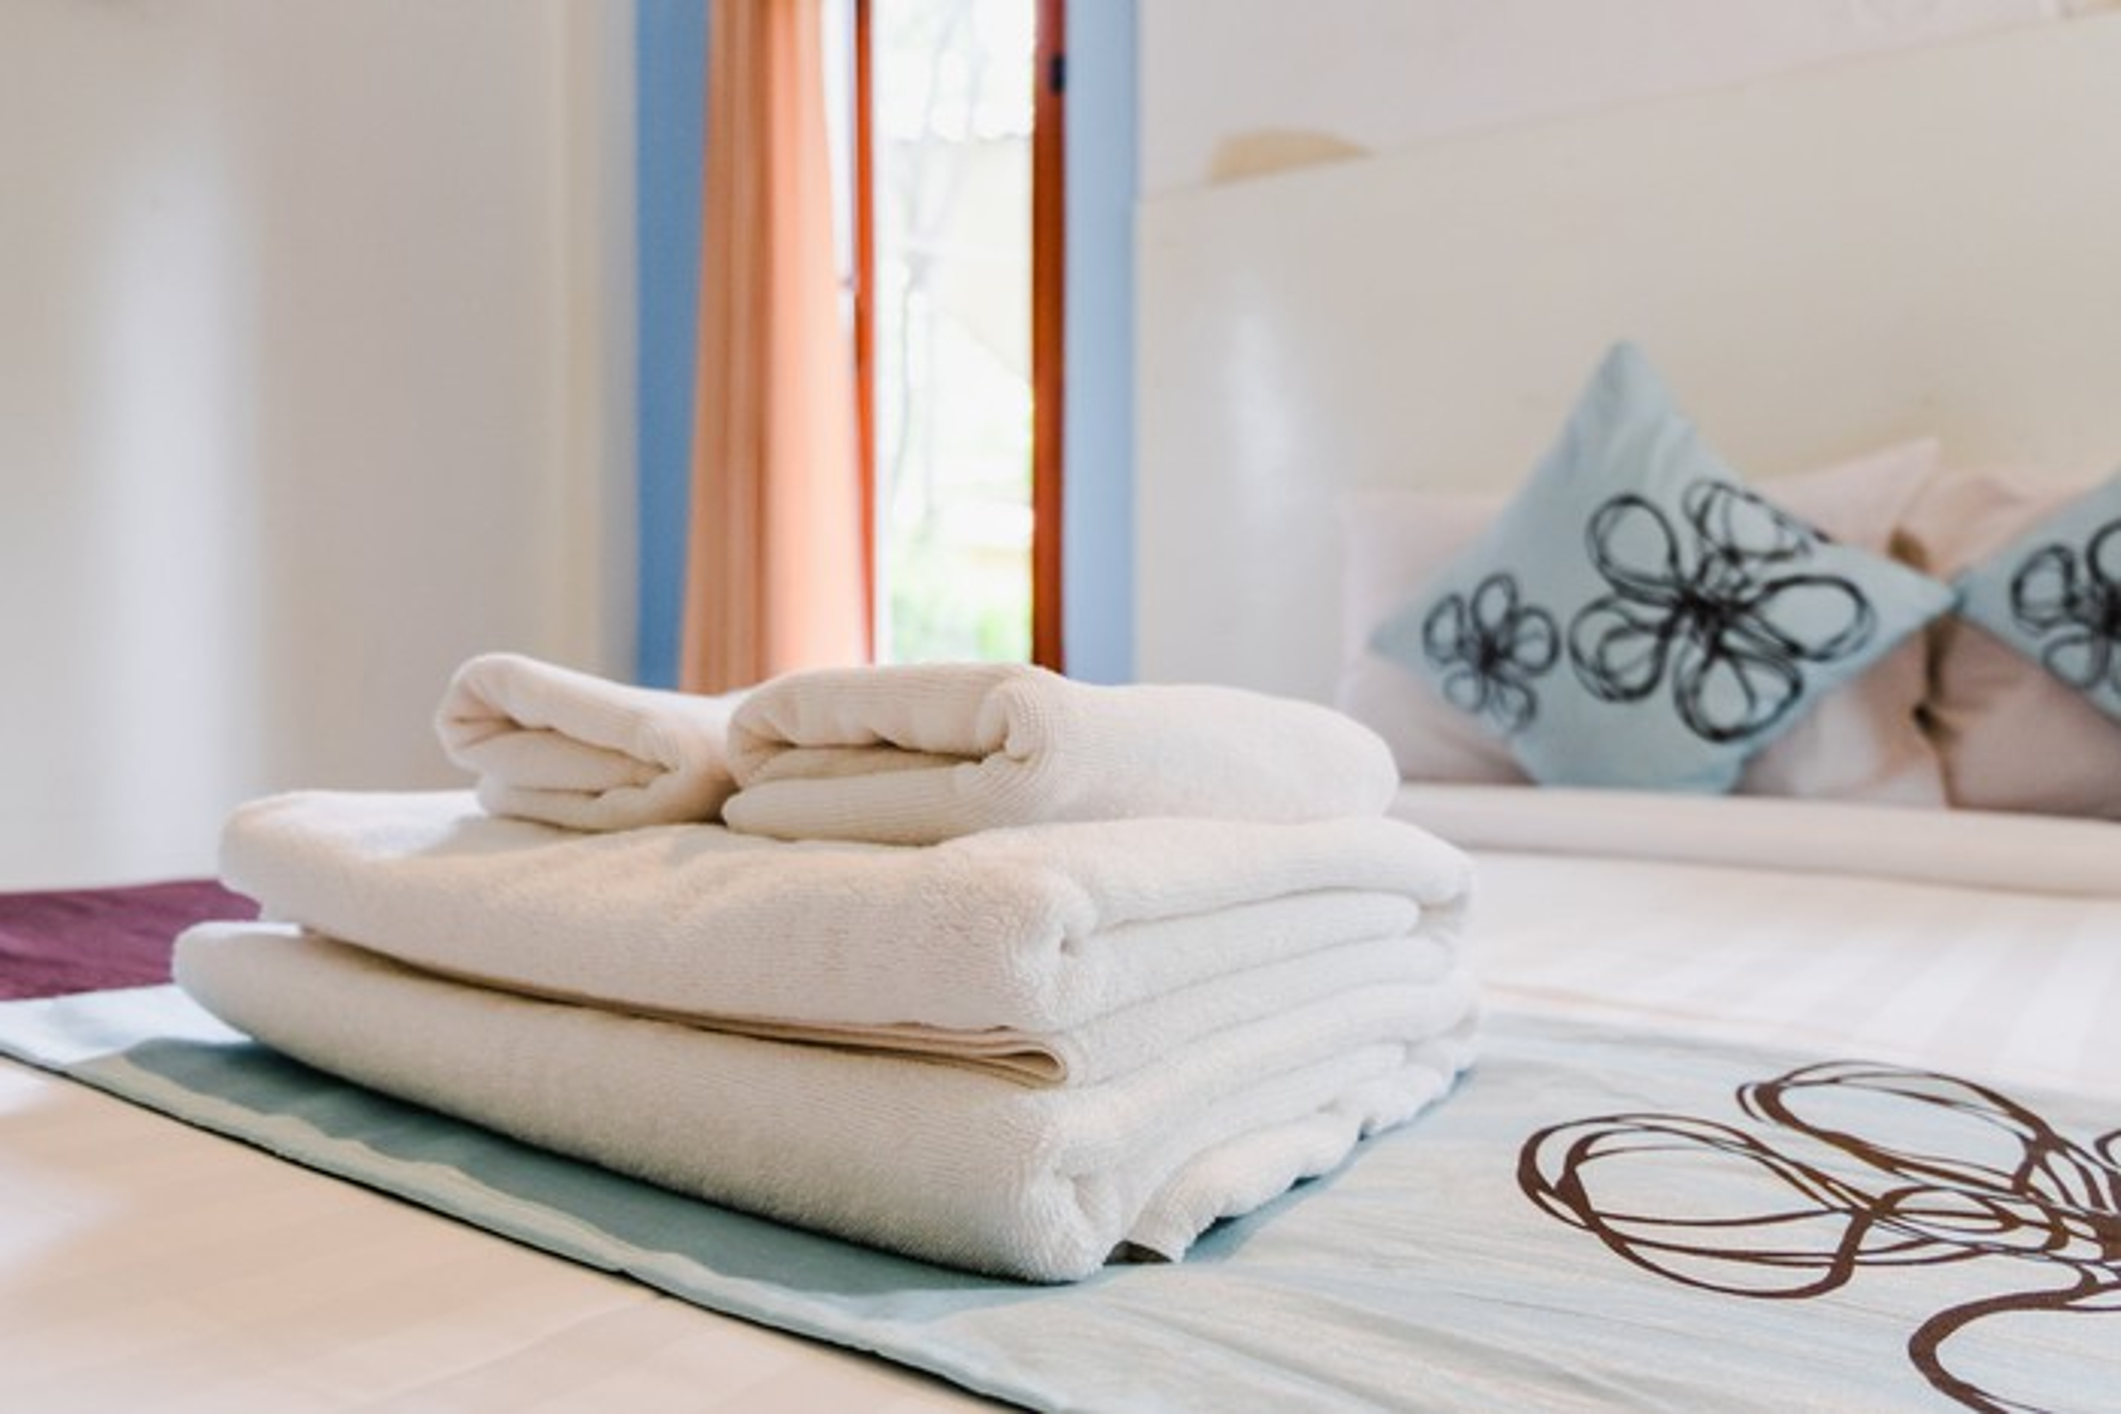 Towels folded on bedspread.